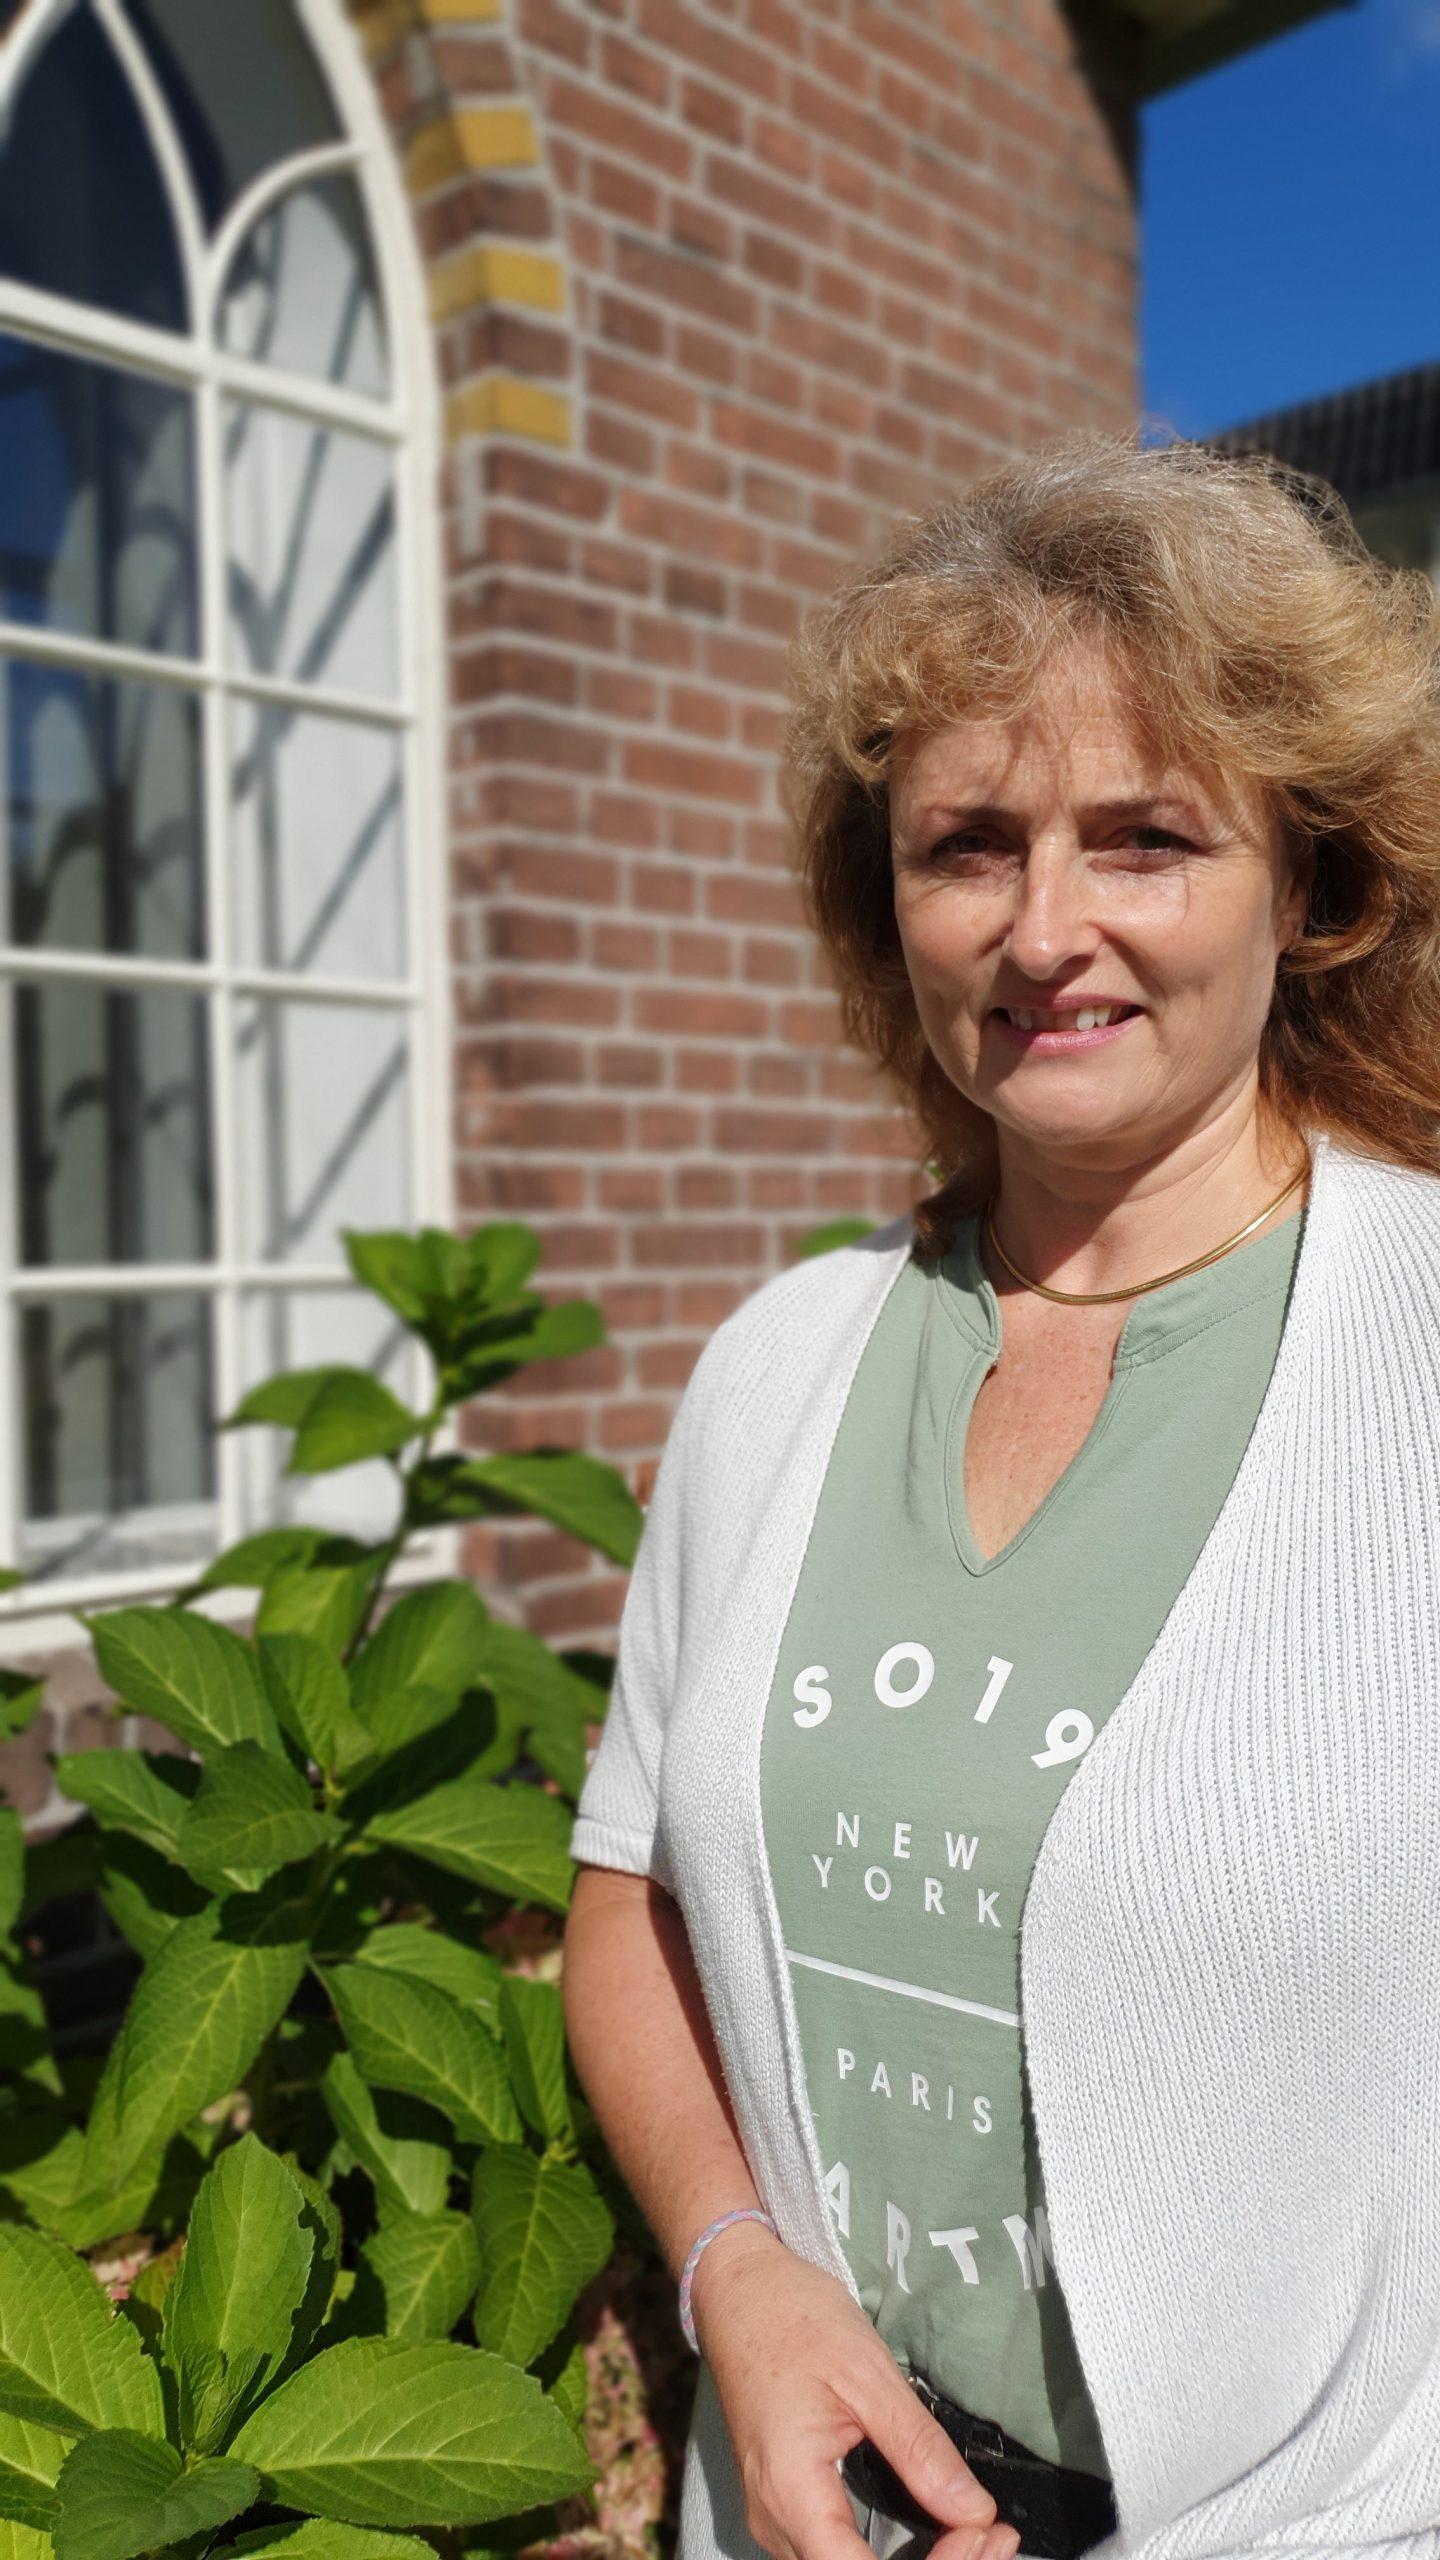 Yin yoga en Pilates in 't Wheemhuus Gezondheidscentrum Zuidwolde